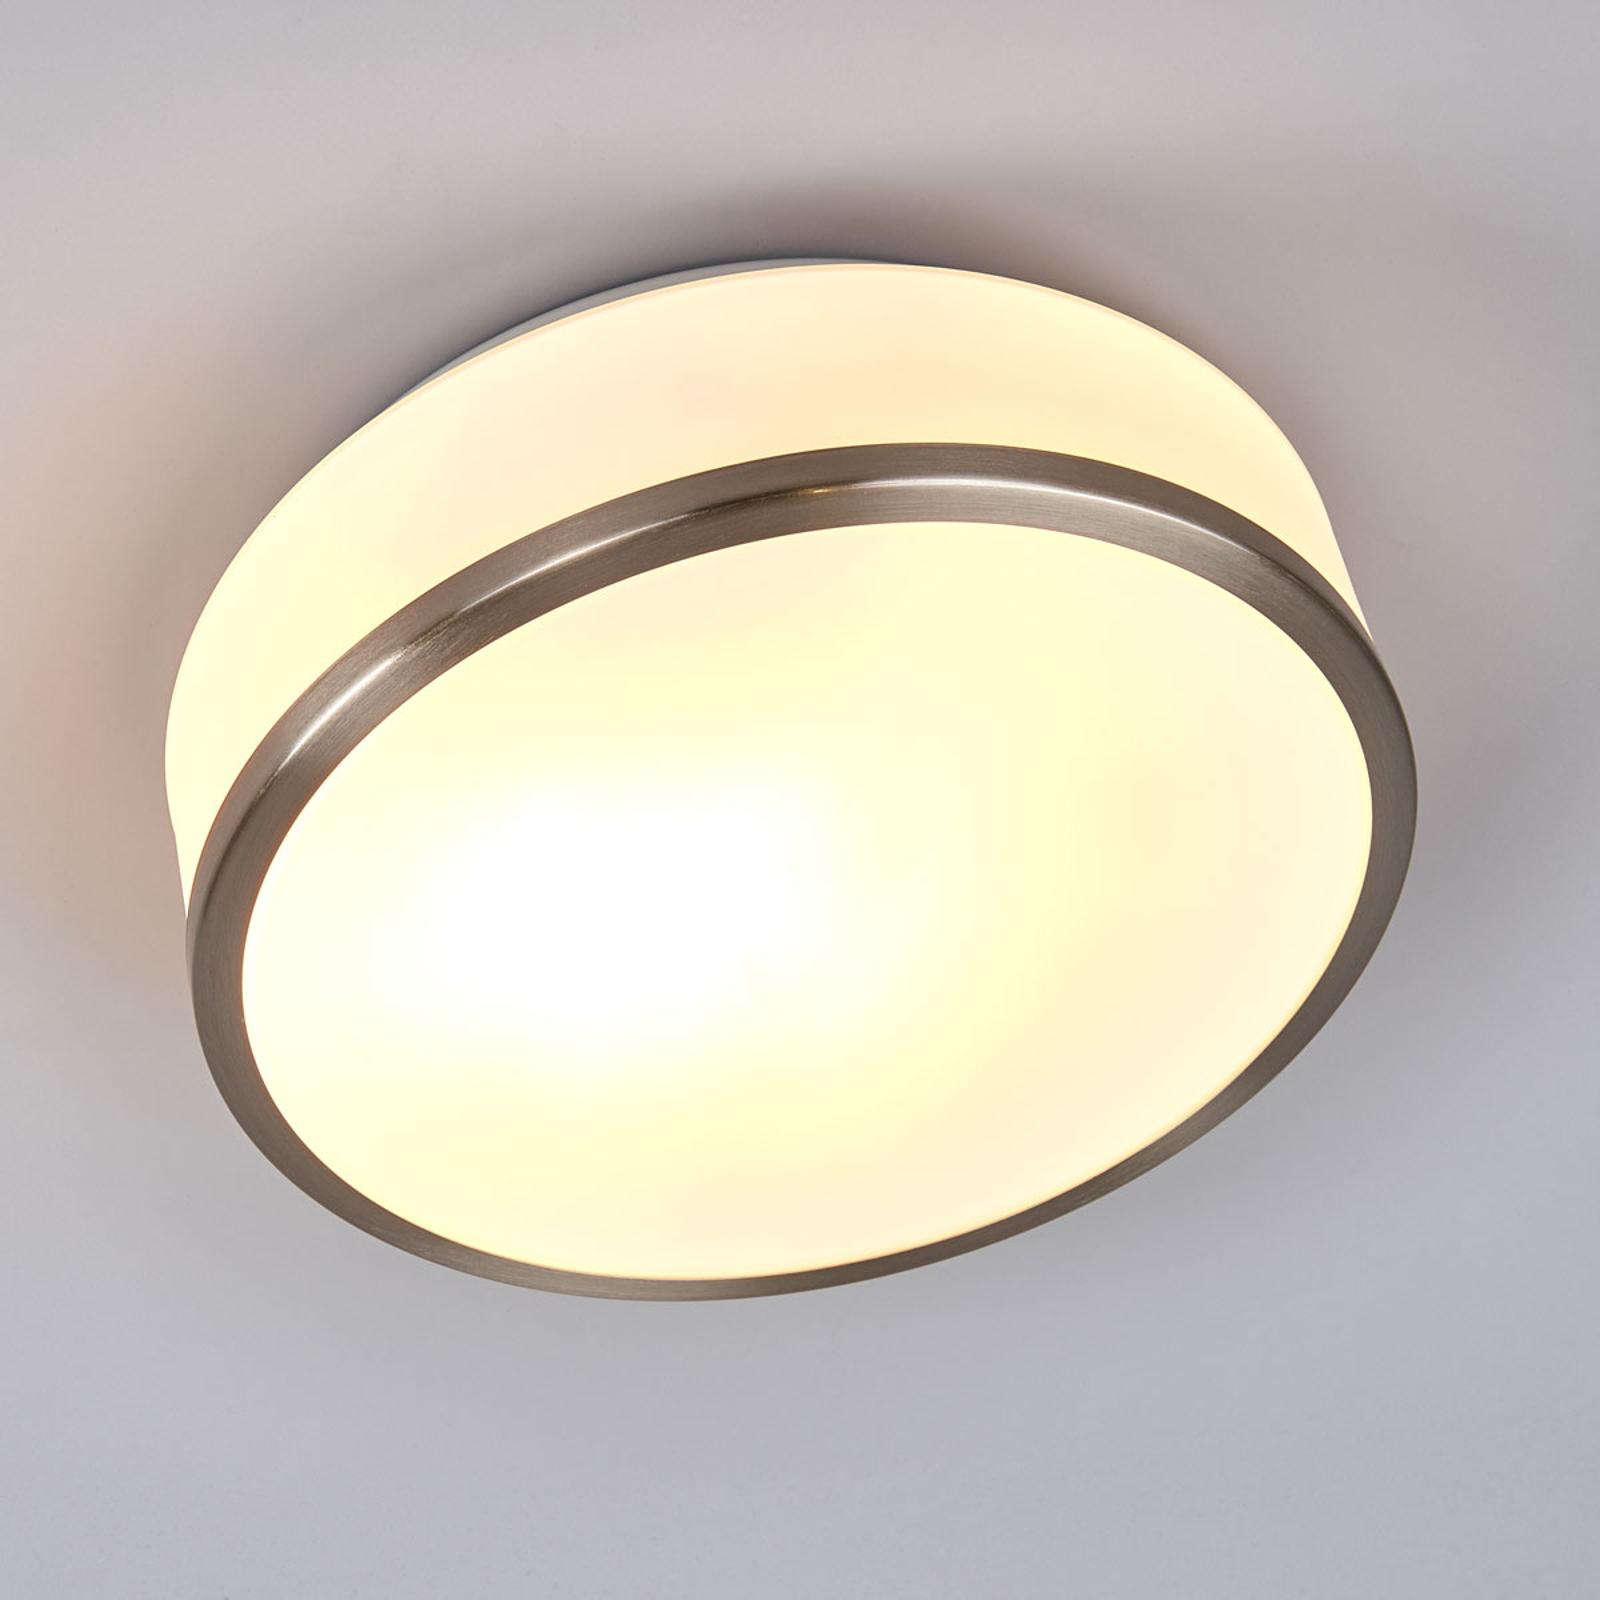 Plafondlamp Flush IP44, Ø 28cm, zilver gesatineerd